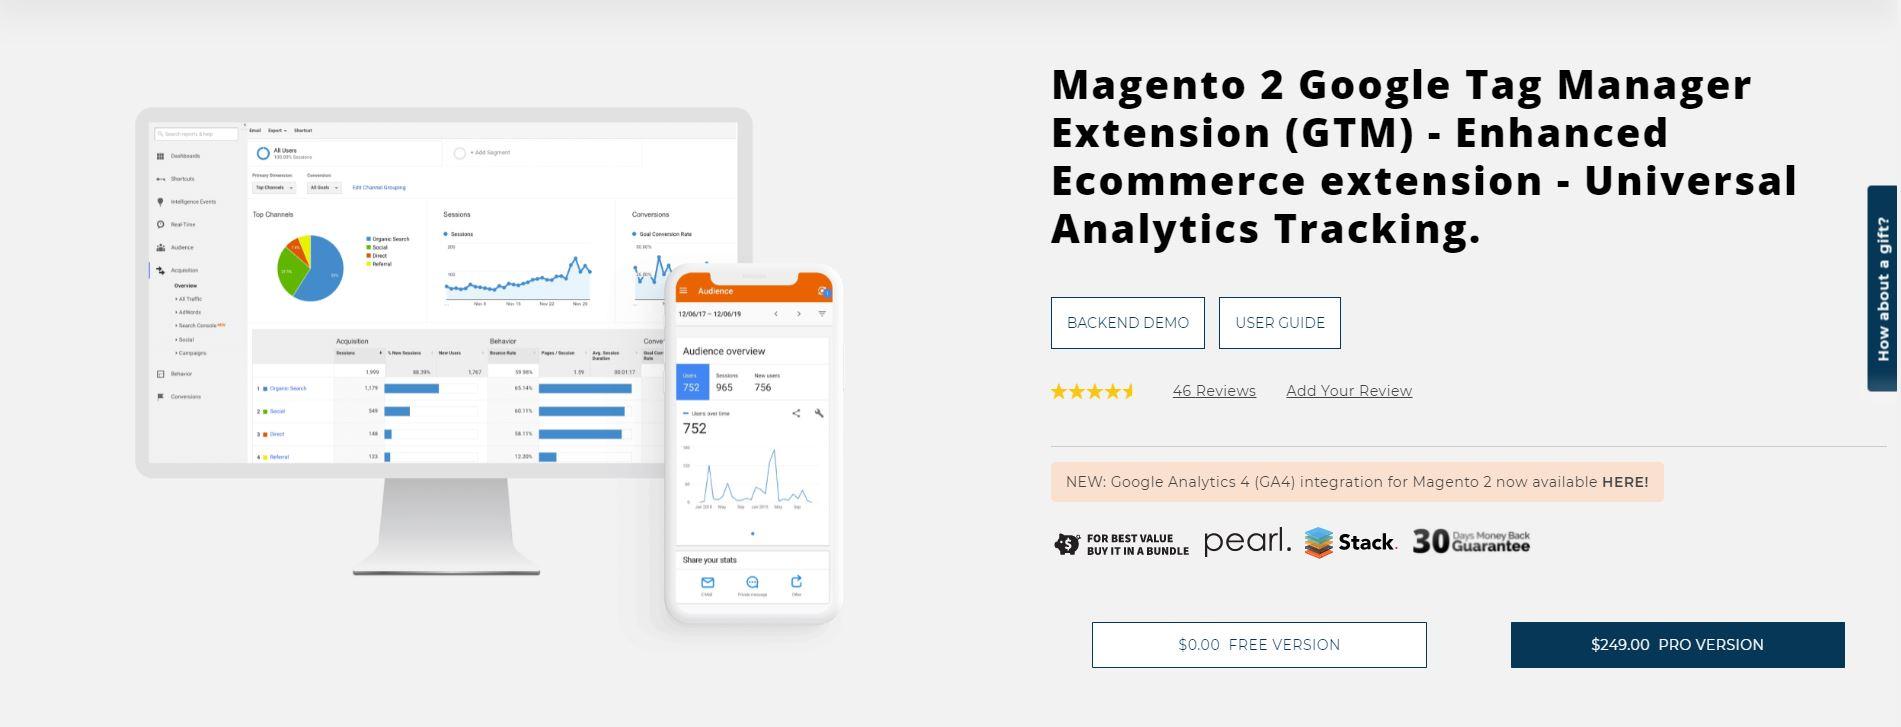 Google tag manager Magento